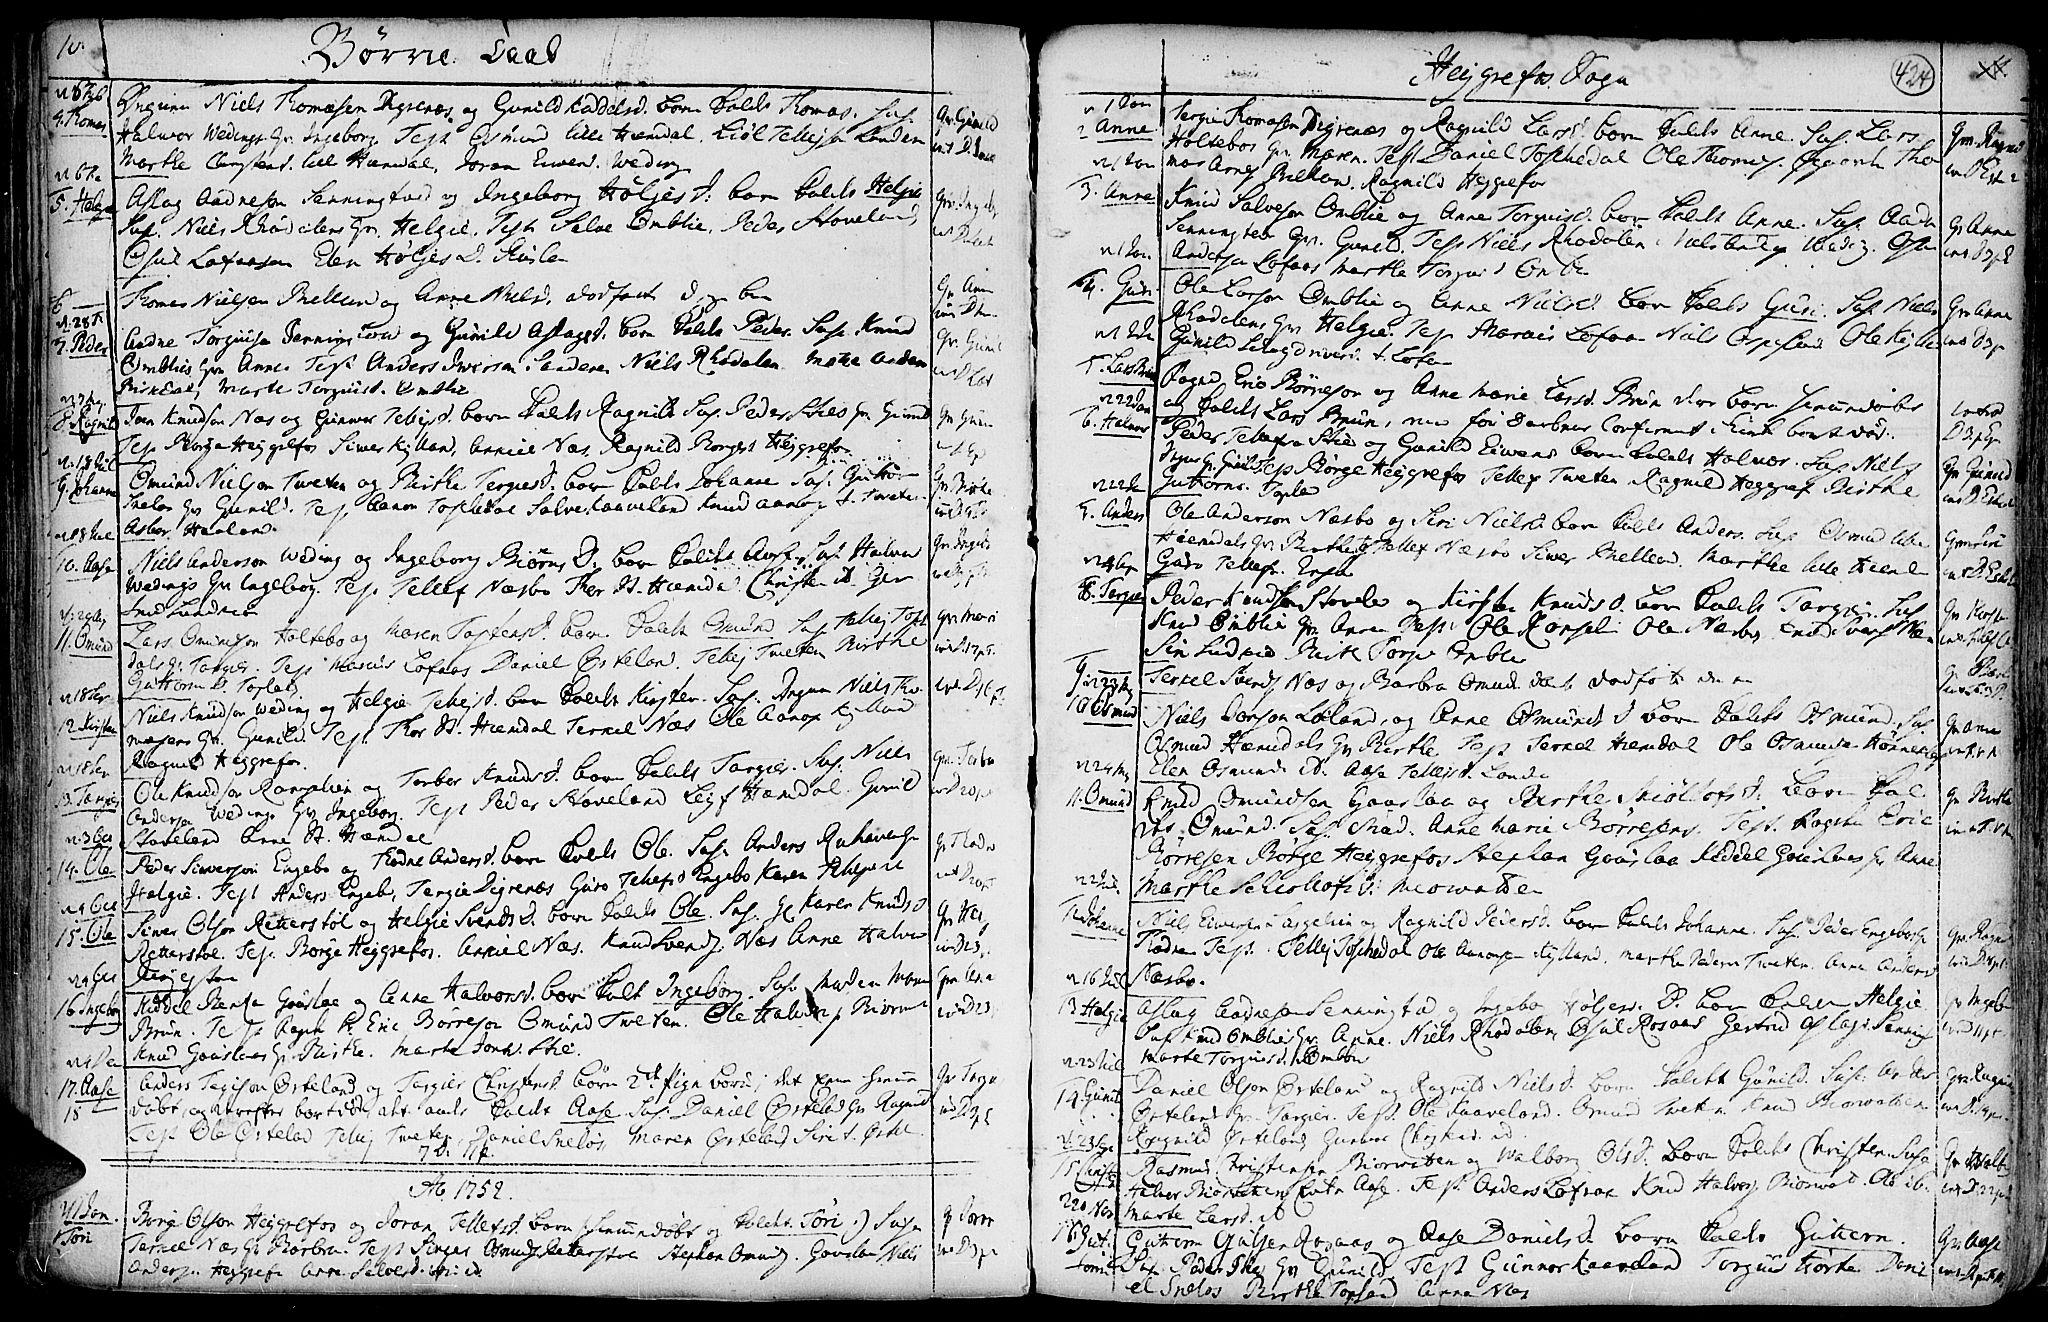 SAK, Hommedal sokneprestkontor, F/Fa/Fab/L0002: Ministerialbok nr. A 2 /3, 1740-1821, s. 424